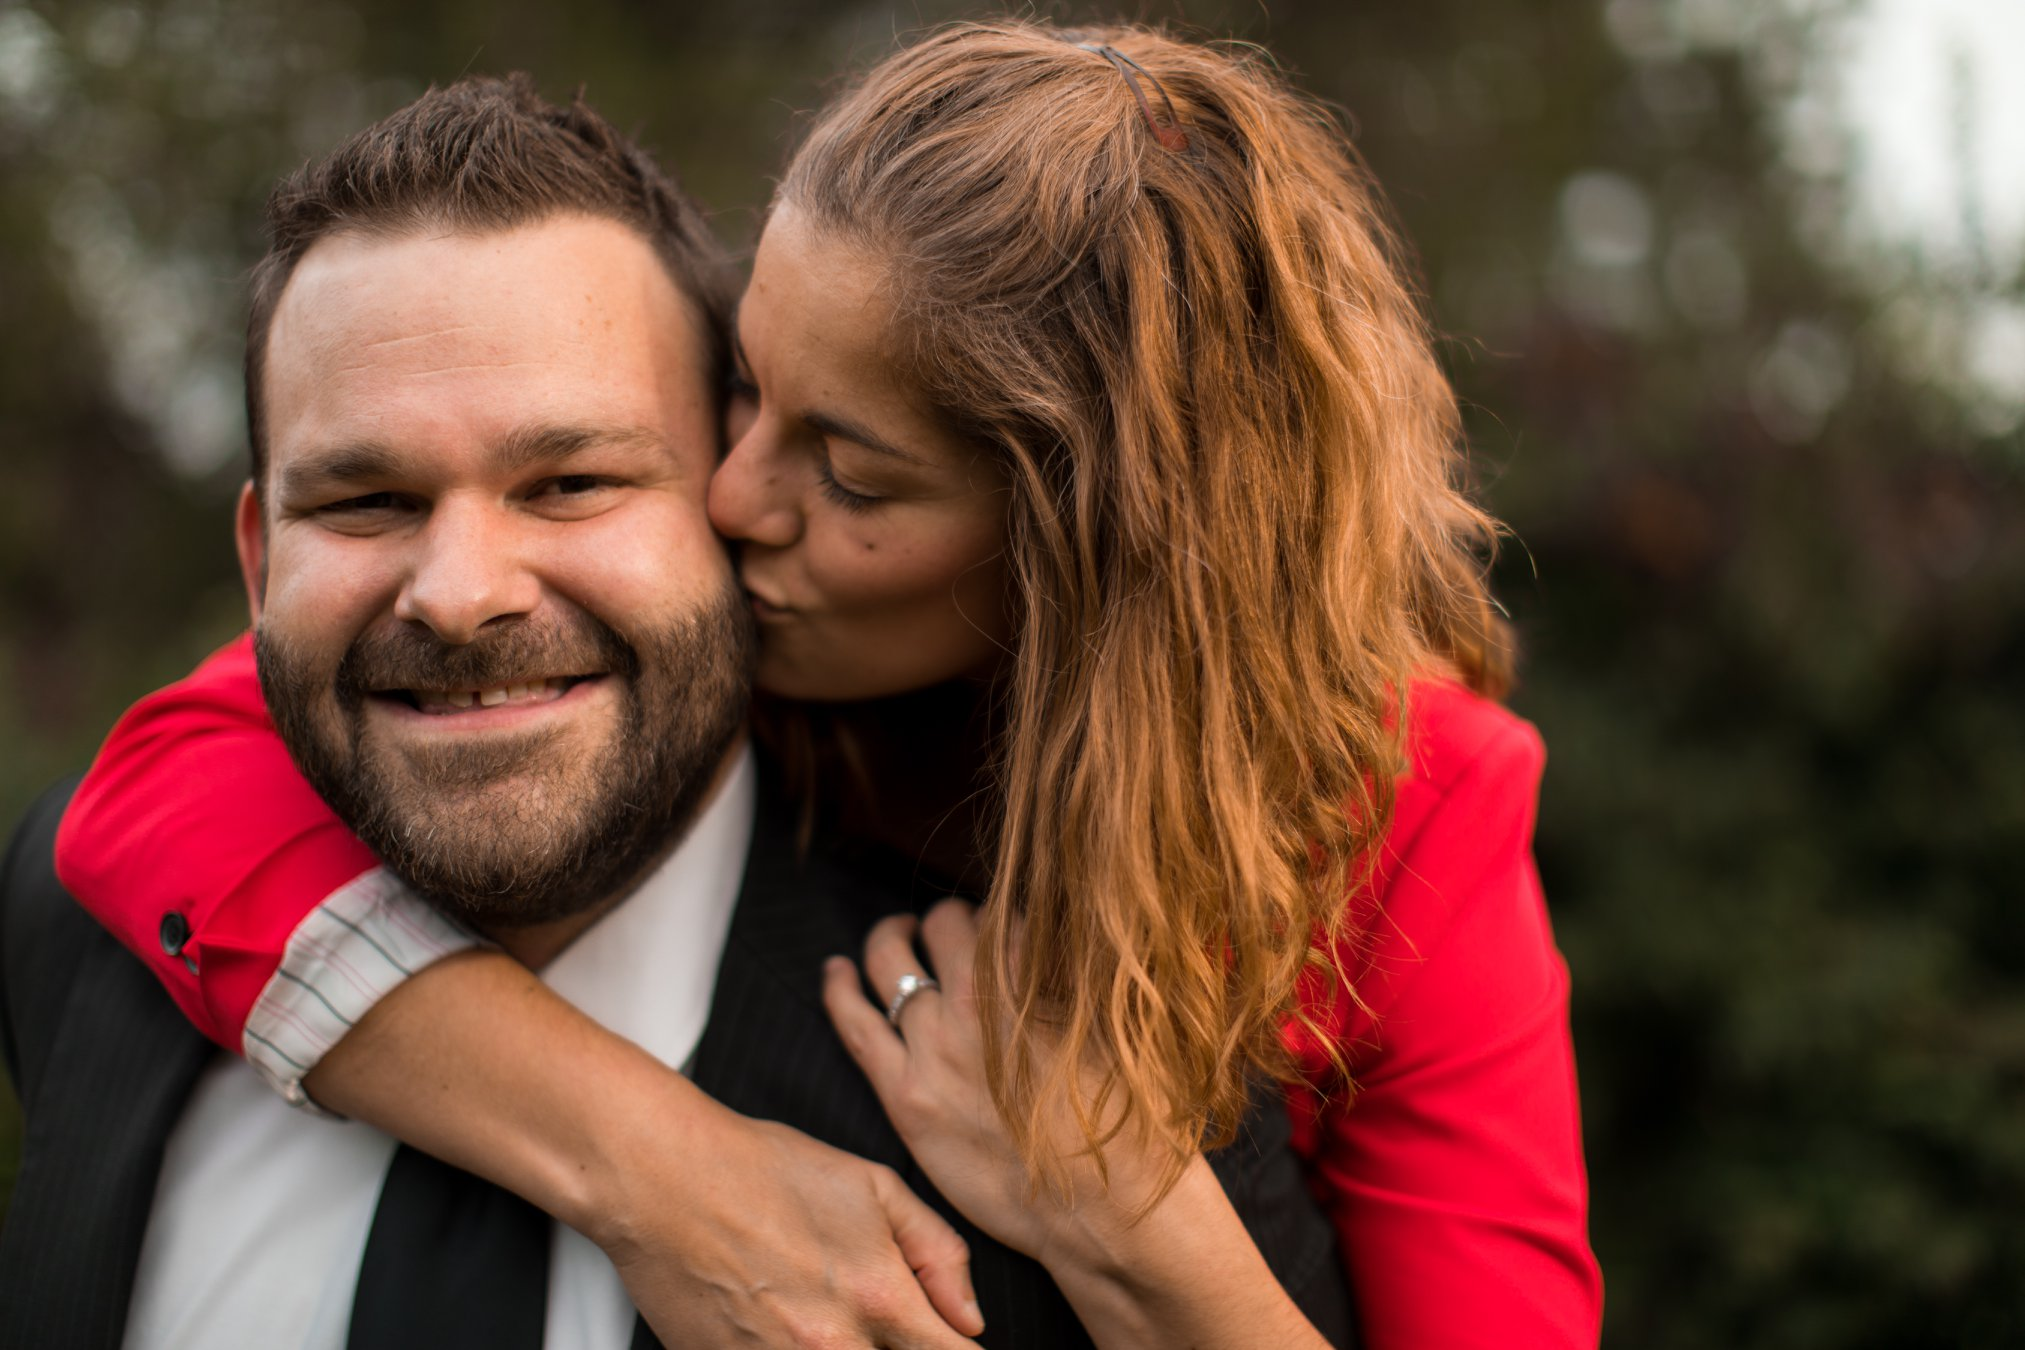 Adam Stultz & Kelly Heck Celebrate their Engagement